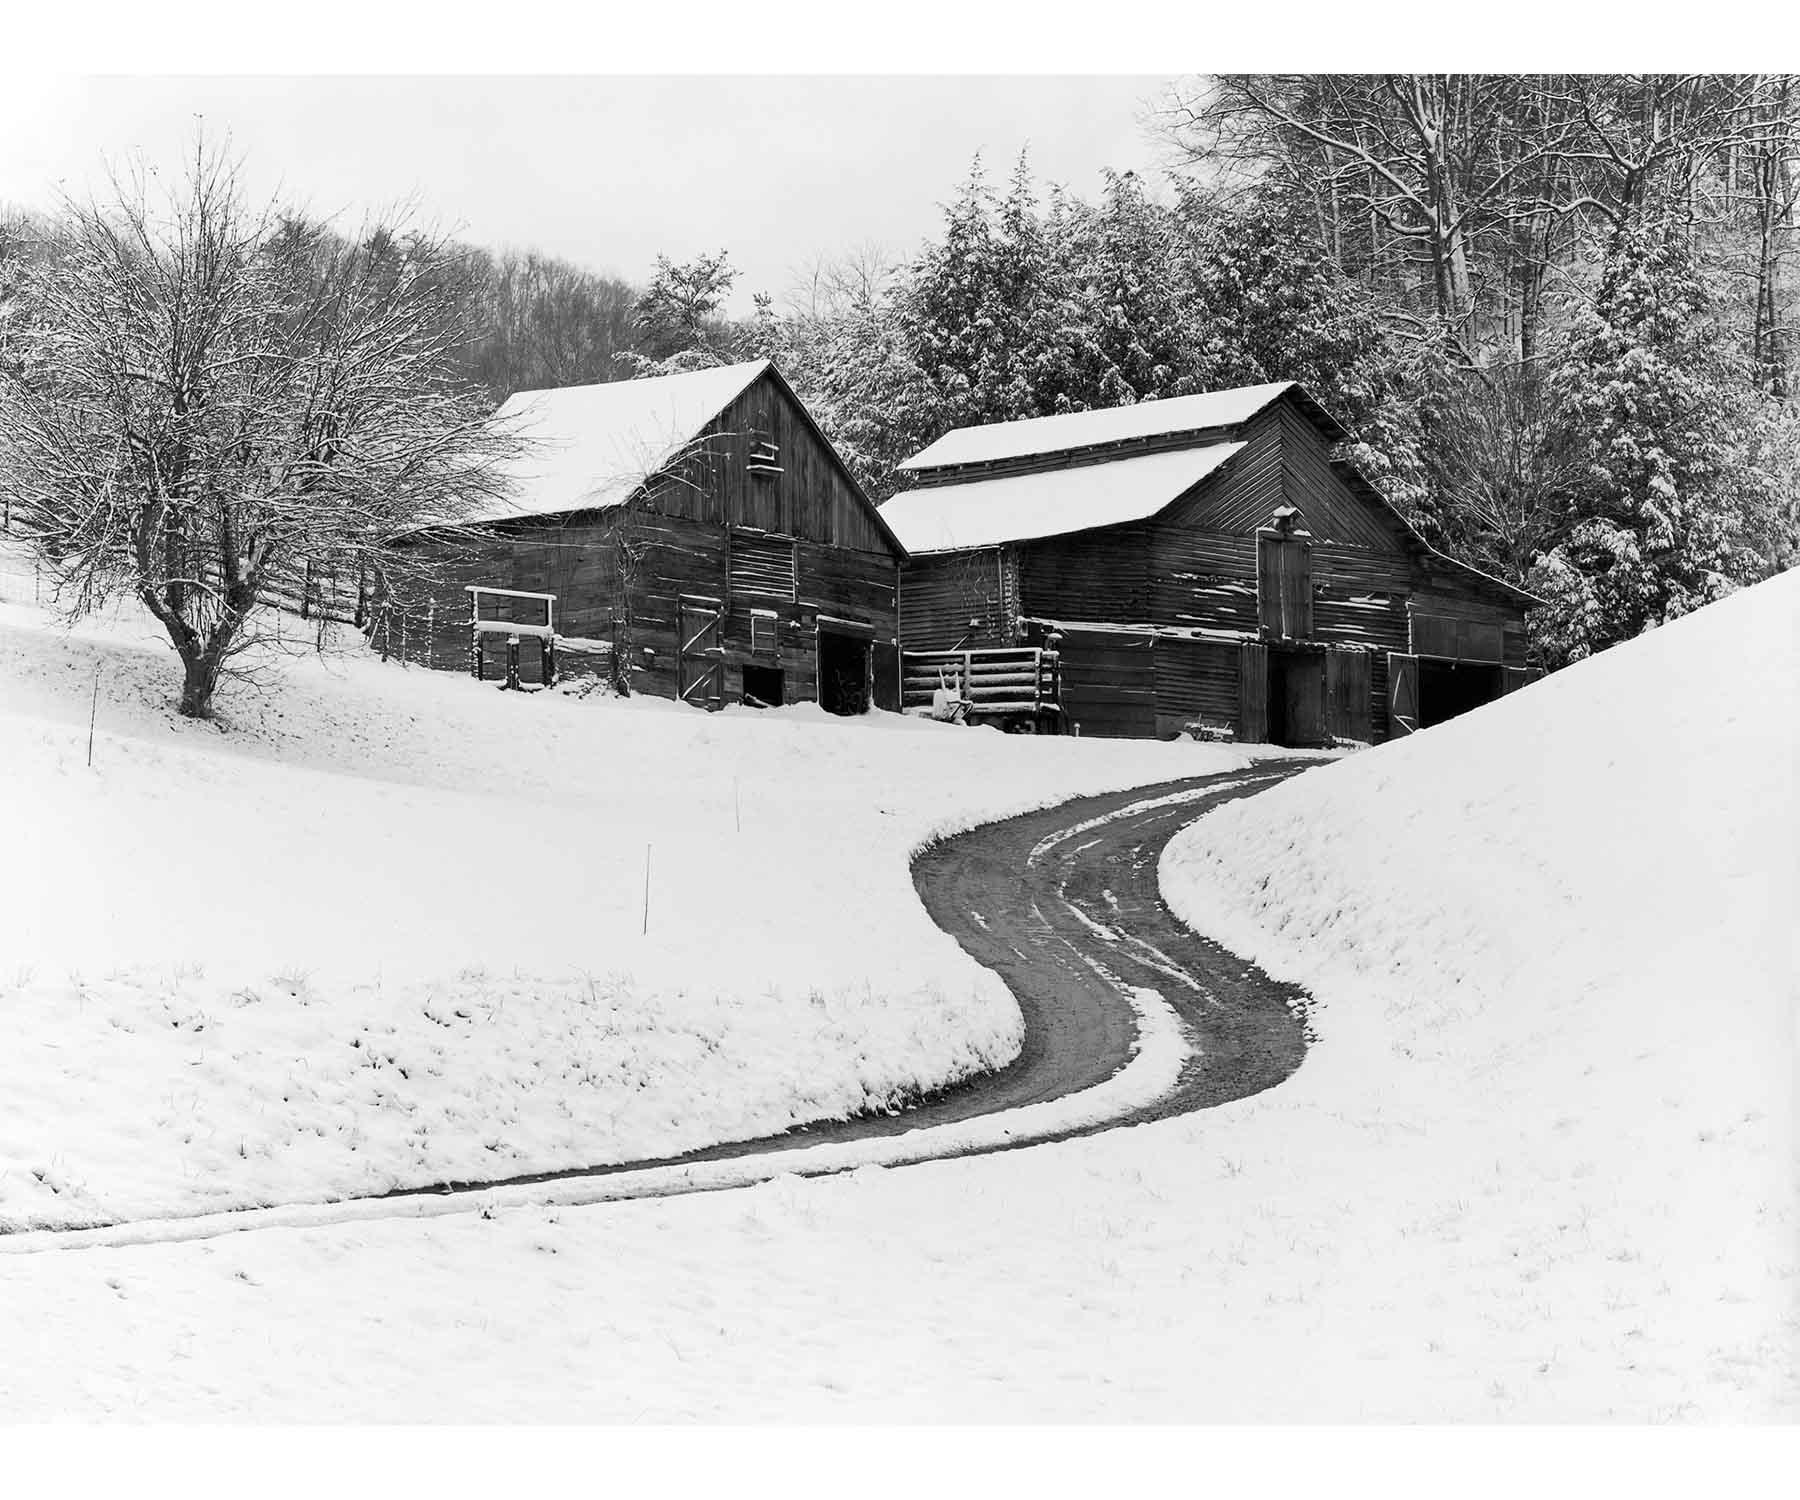 Appalachian snow barns The Face of Appalachia Tim Barnwell photography